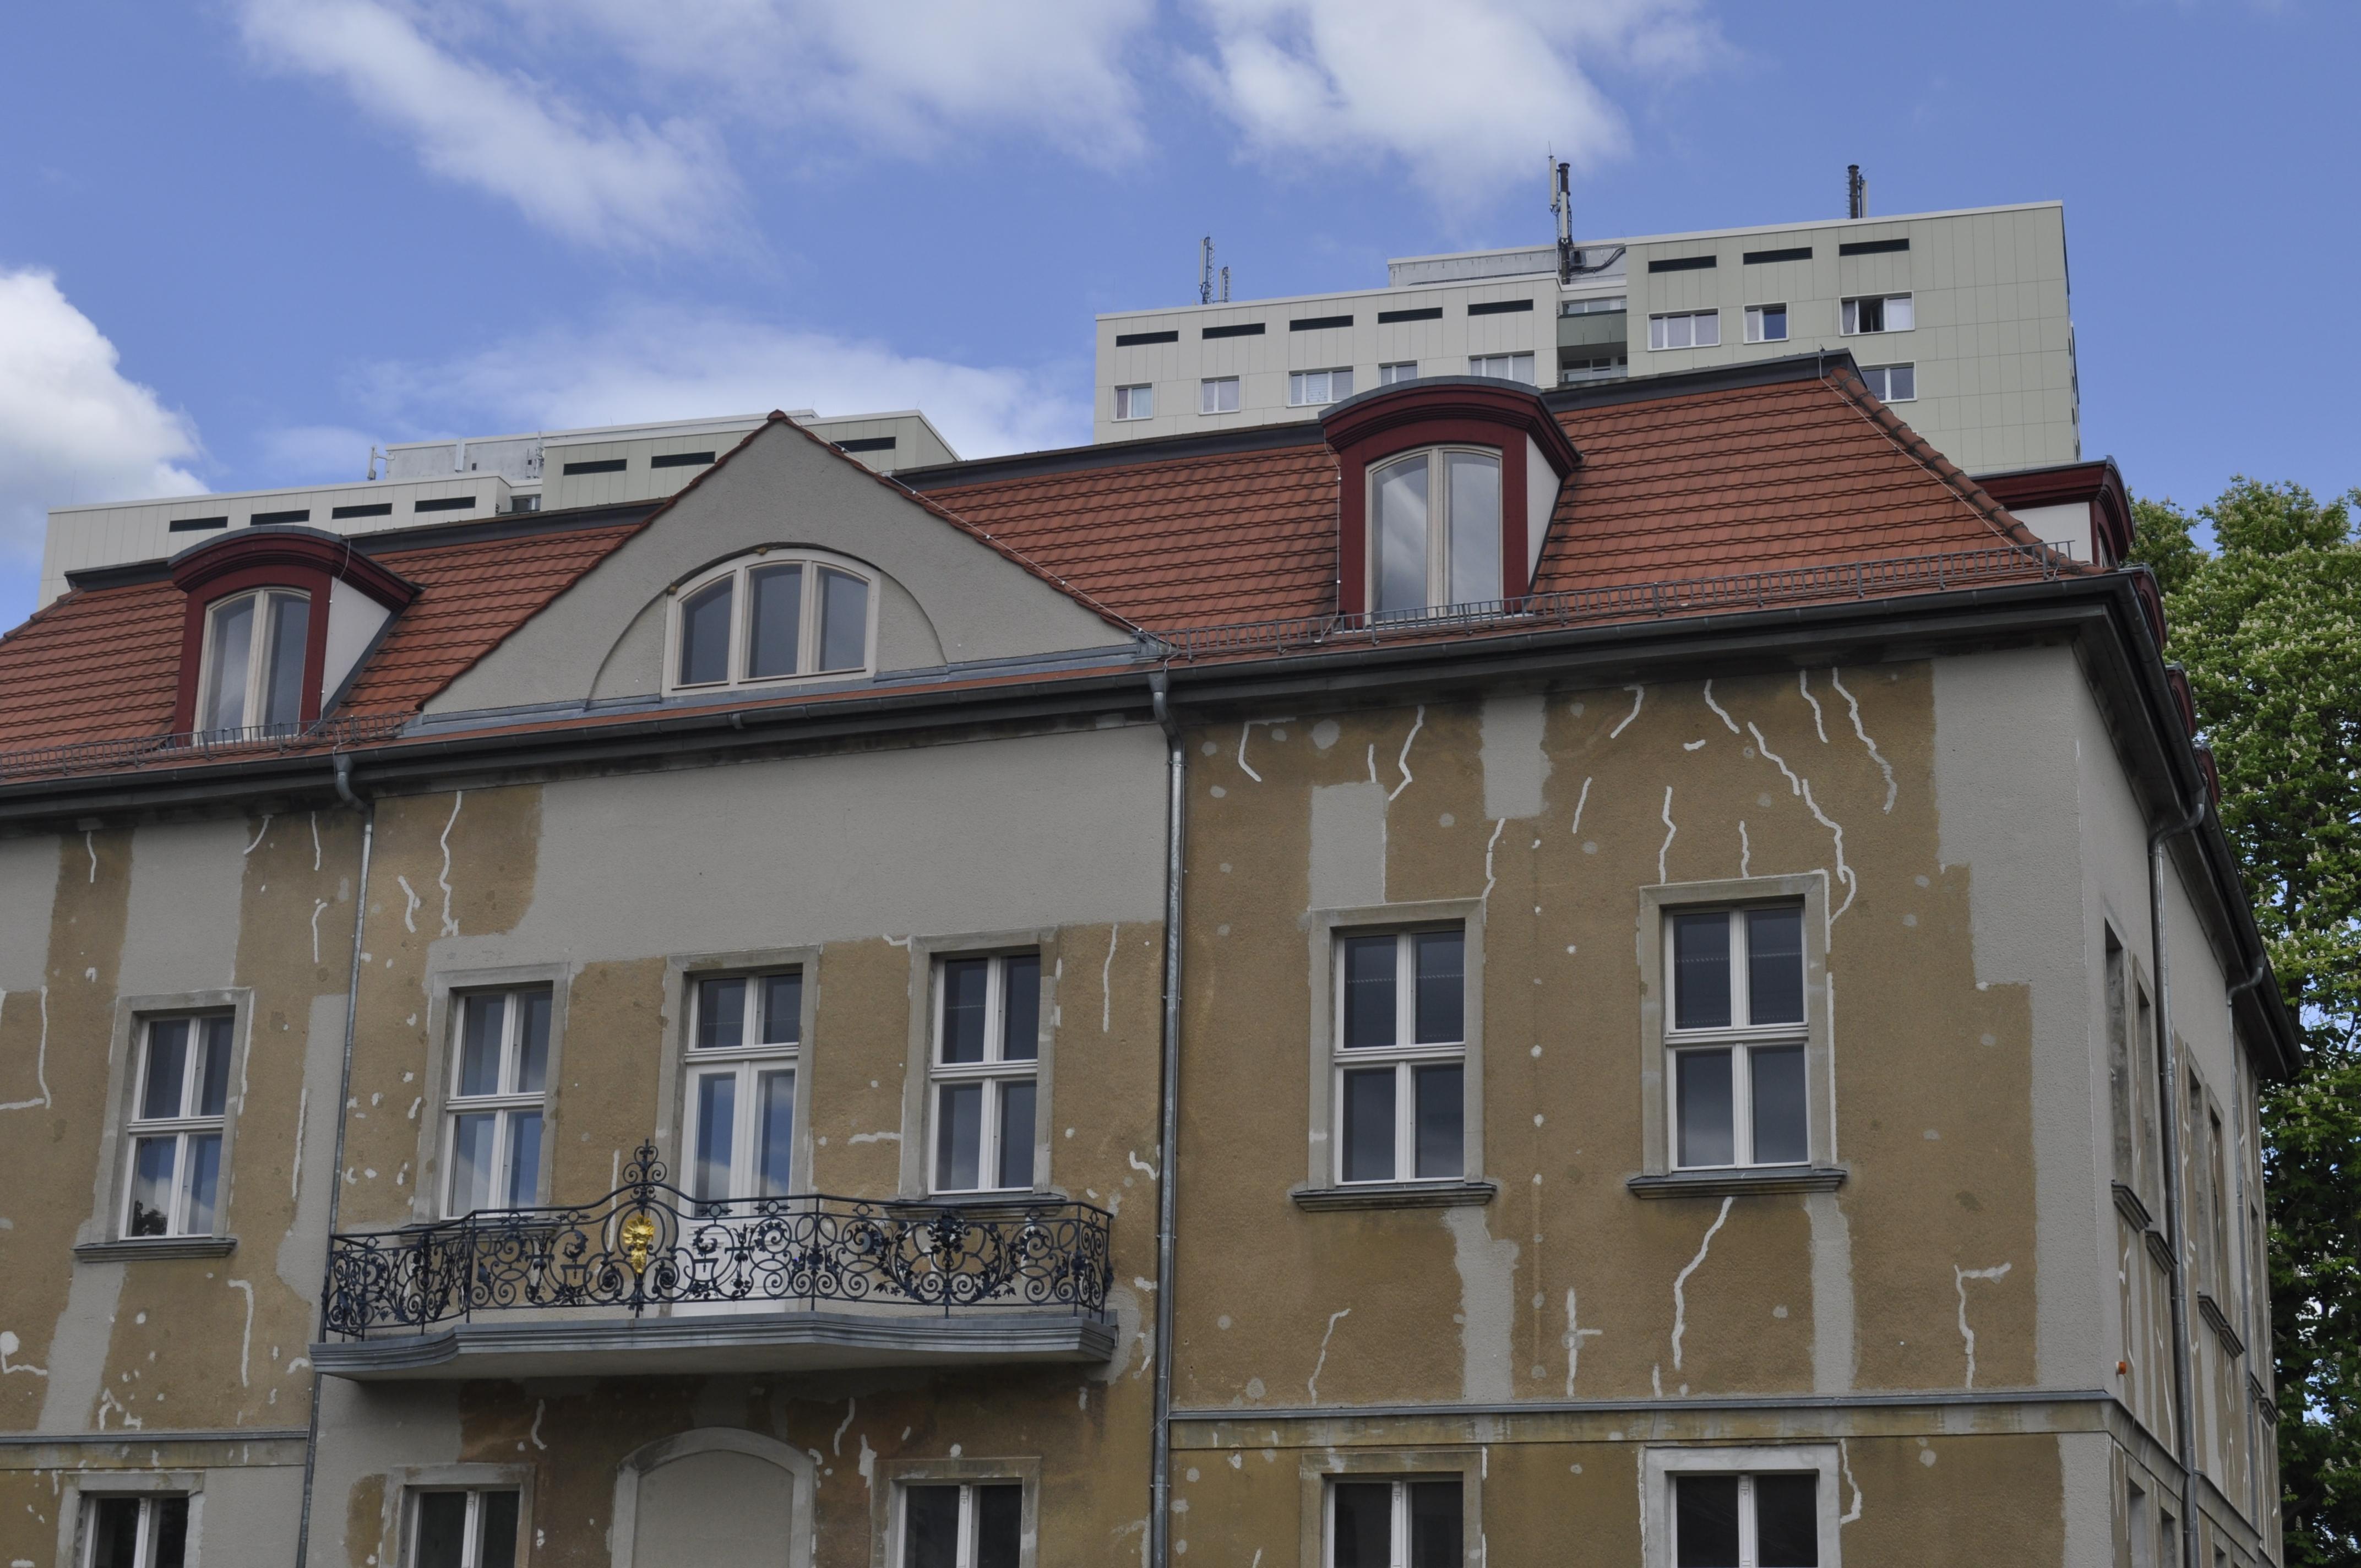 Konrad Wolf Straße 39